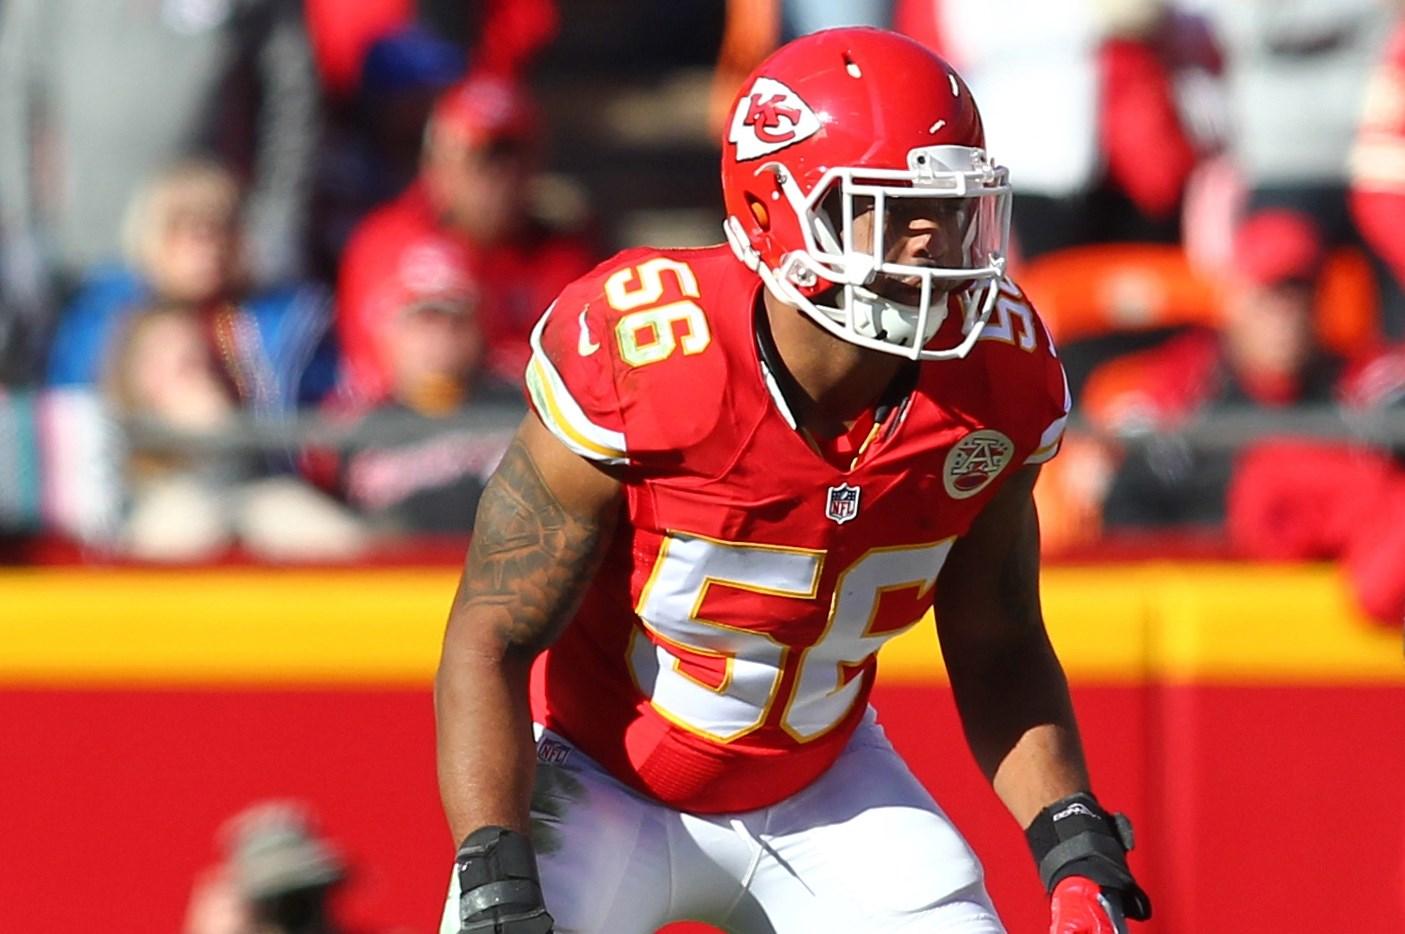 Kansas City Chiefs linebacker Derrick Johnson (56) defends against the Tampa Bay Buccaneers during an NFL game on Sunday Nov. 20, 2016 at Arrowhead Stadium in Kansas City, Mo. The Buccaneers won 19-17. (AP Photo/TUSP, Jay Biggerstaff)